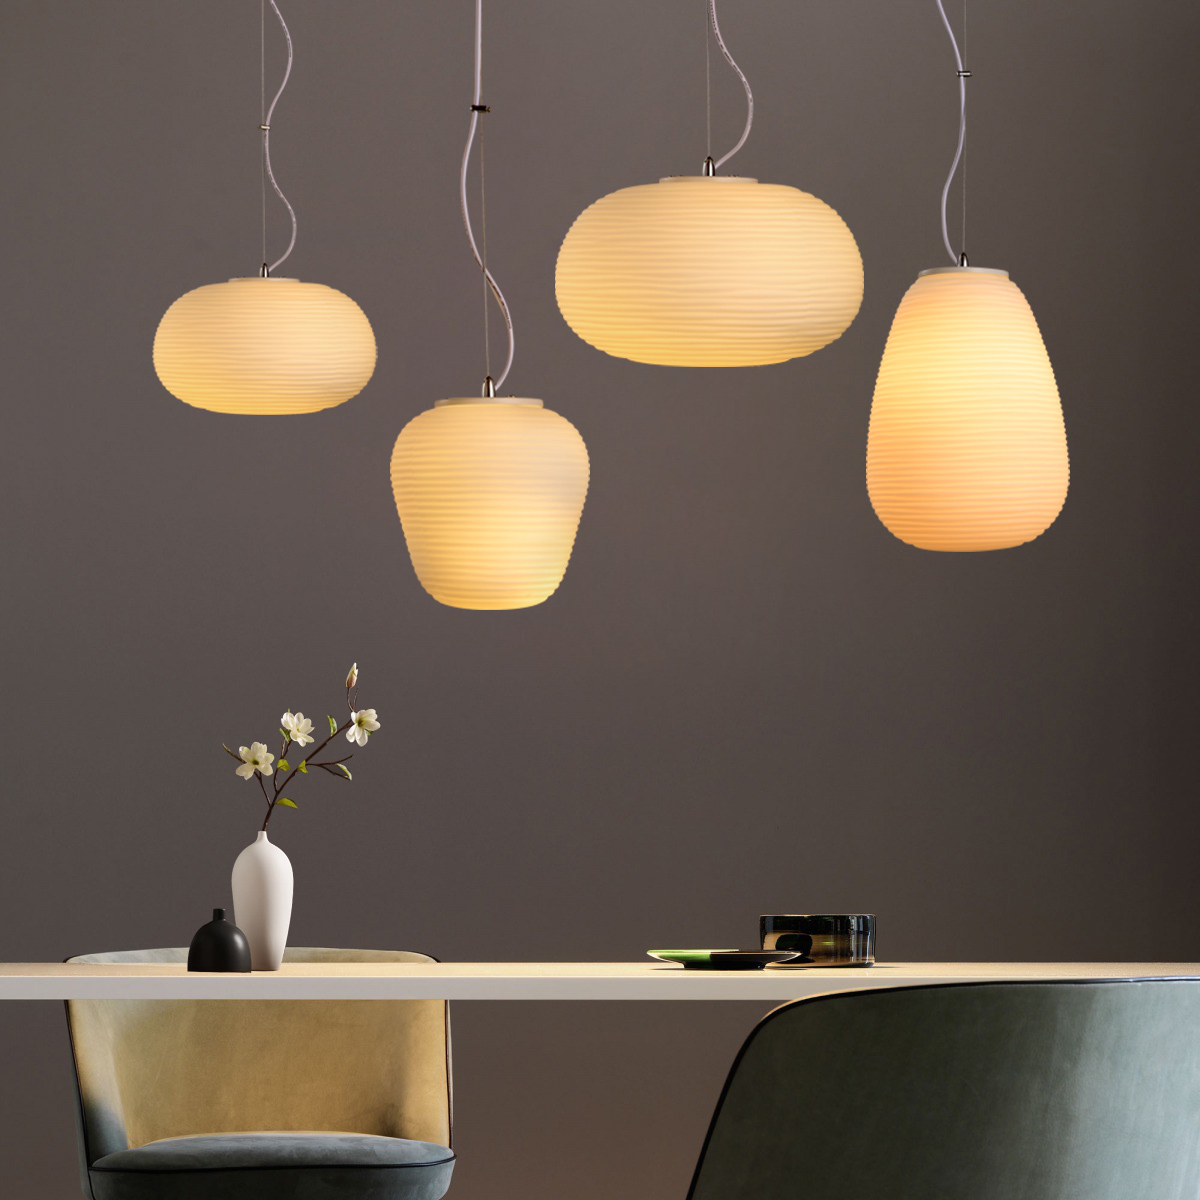 asian lighting. southeast asian japanese style creative tatami glass pendant light restaurant bar dining room hanging lamp lighting d